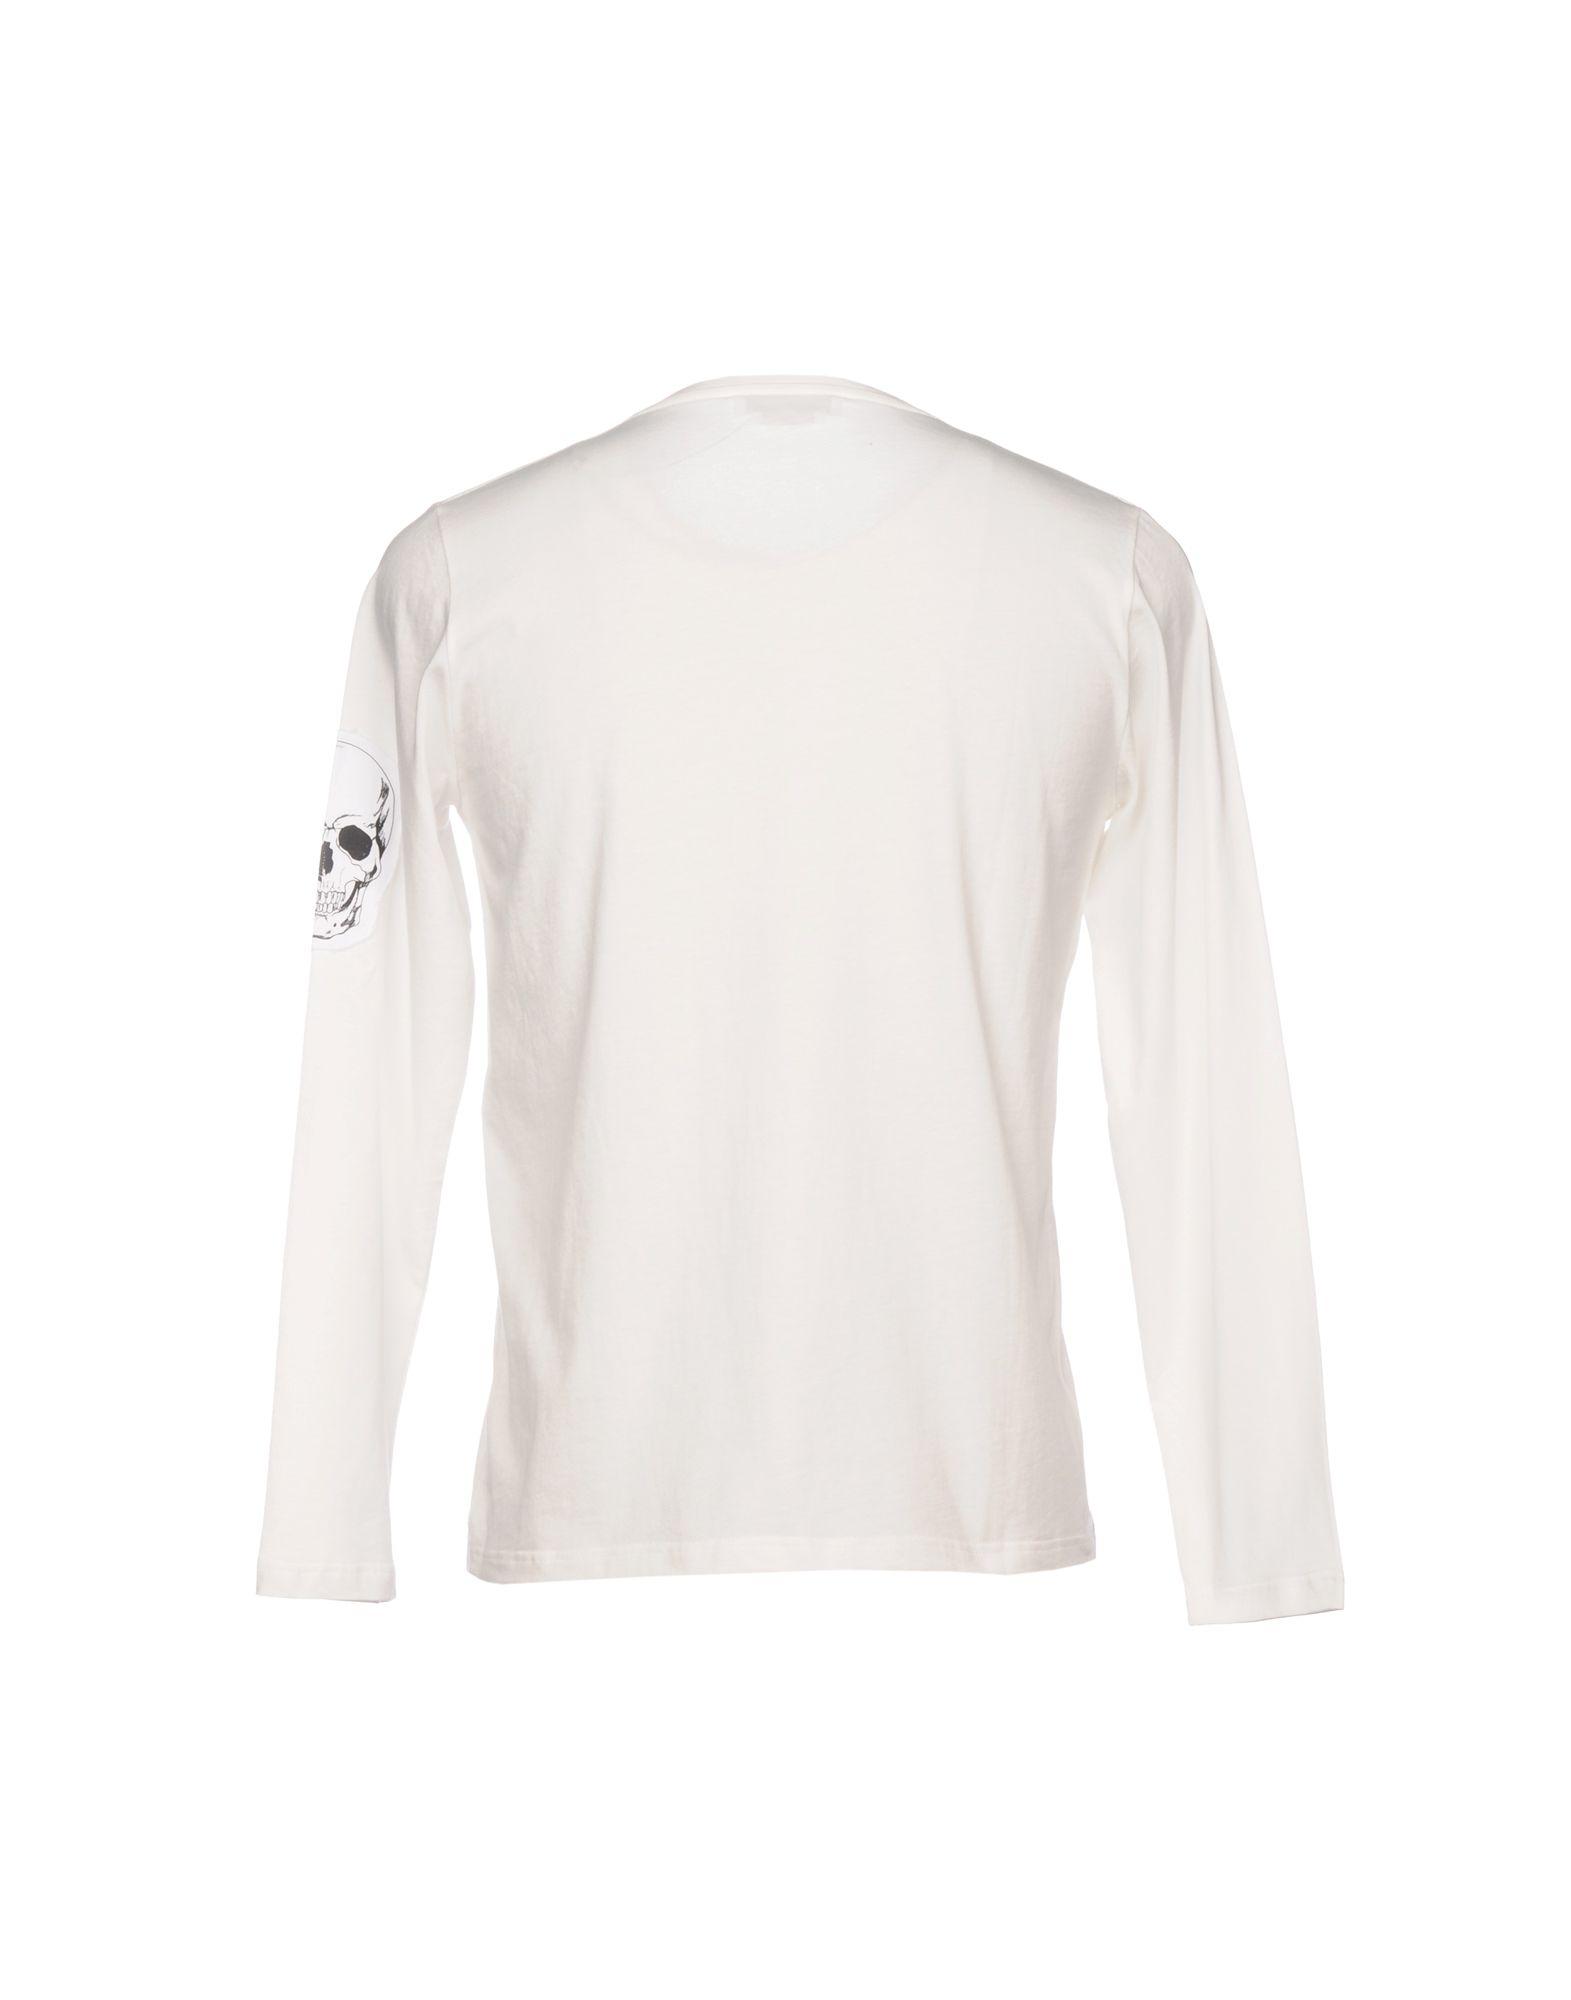 T-Shirt Alexander Mcqueen Uomo Uomo Uomo - 12152368FE dab8c6